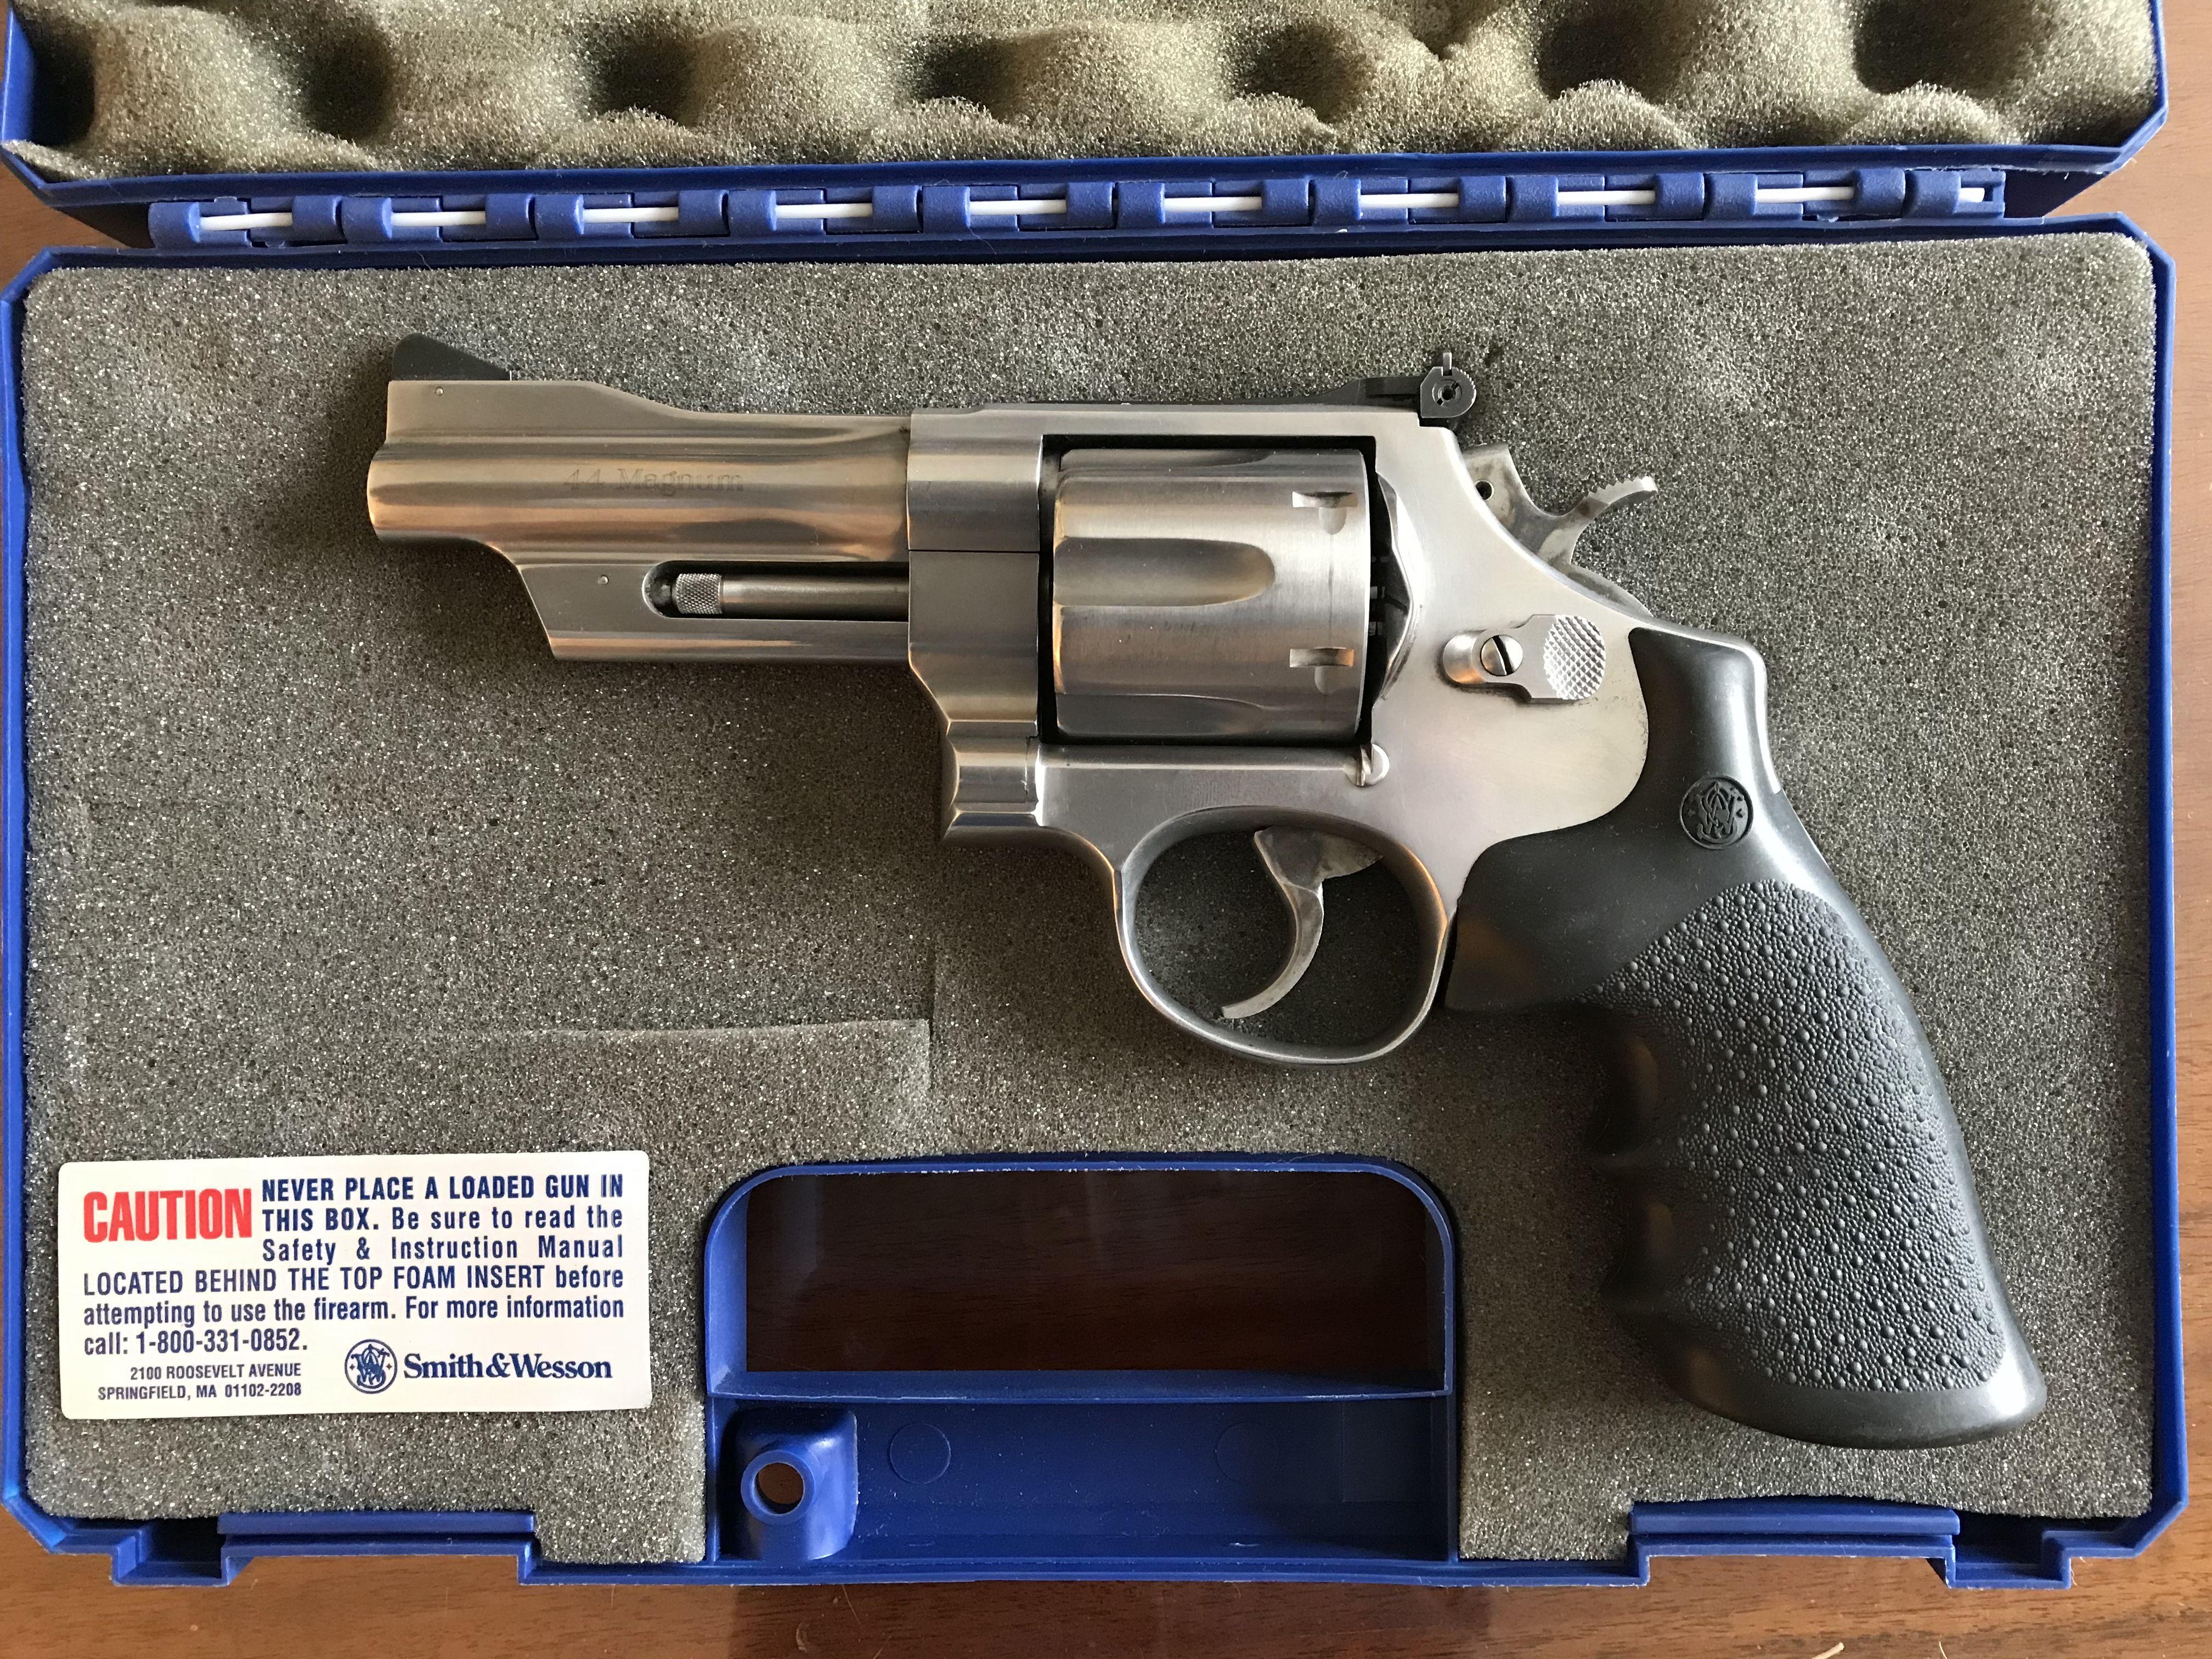 Smith & Wesson Model 629 Mountain Gun 44 Mag. image 1